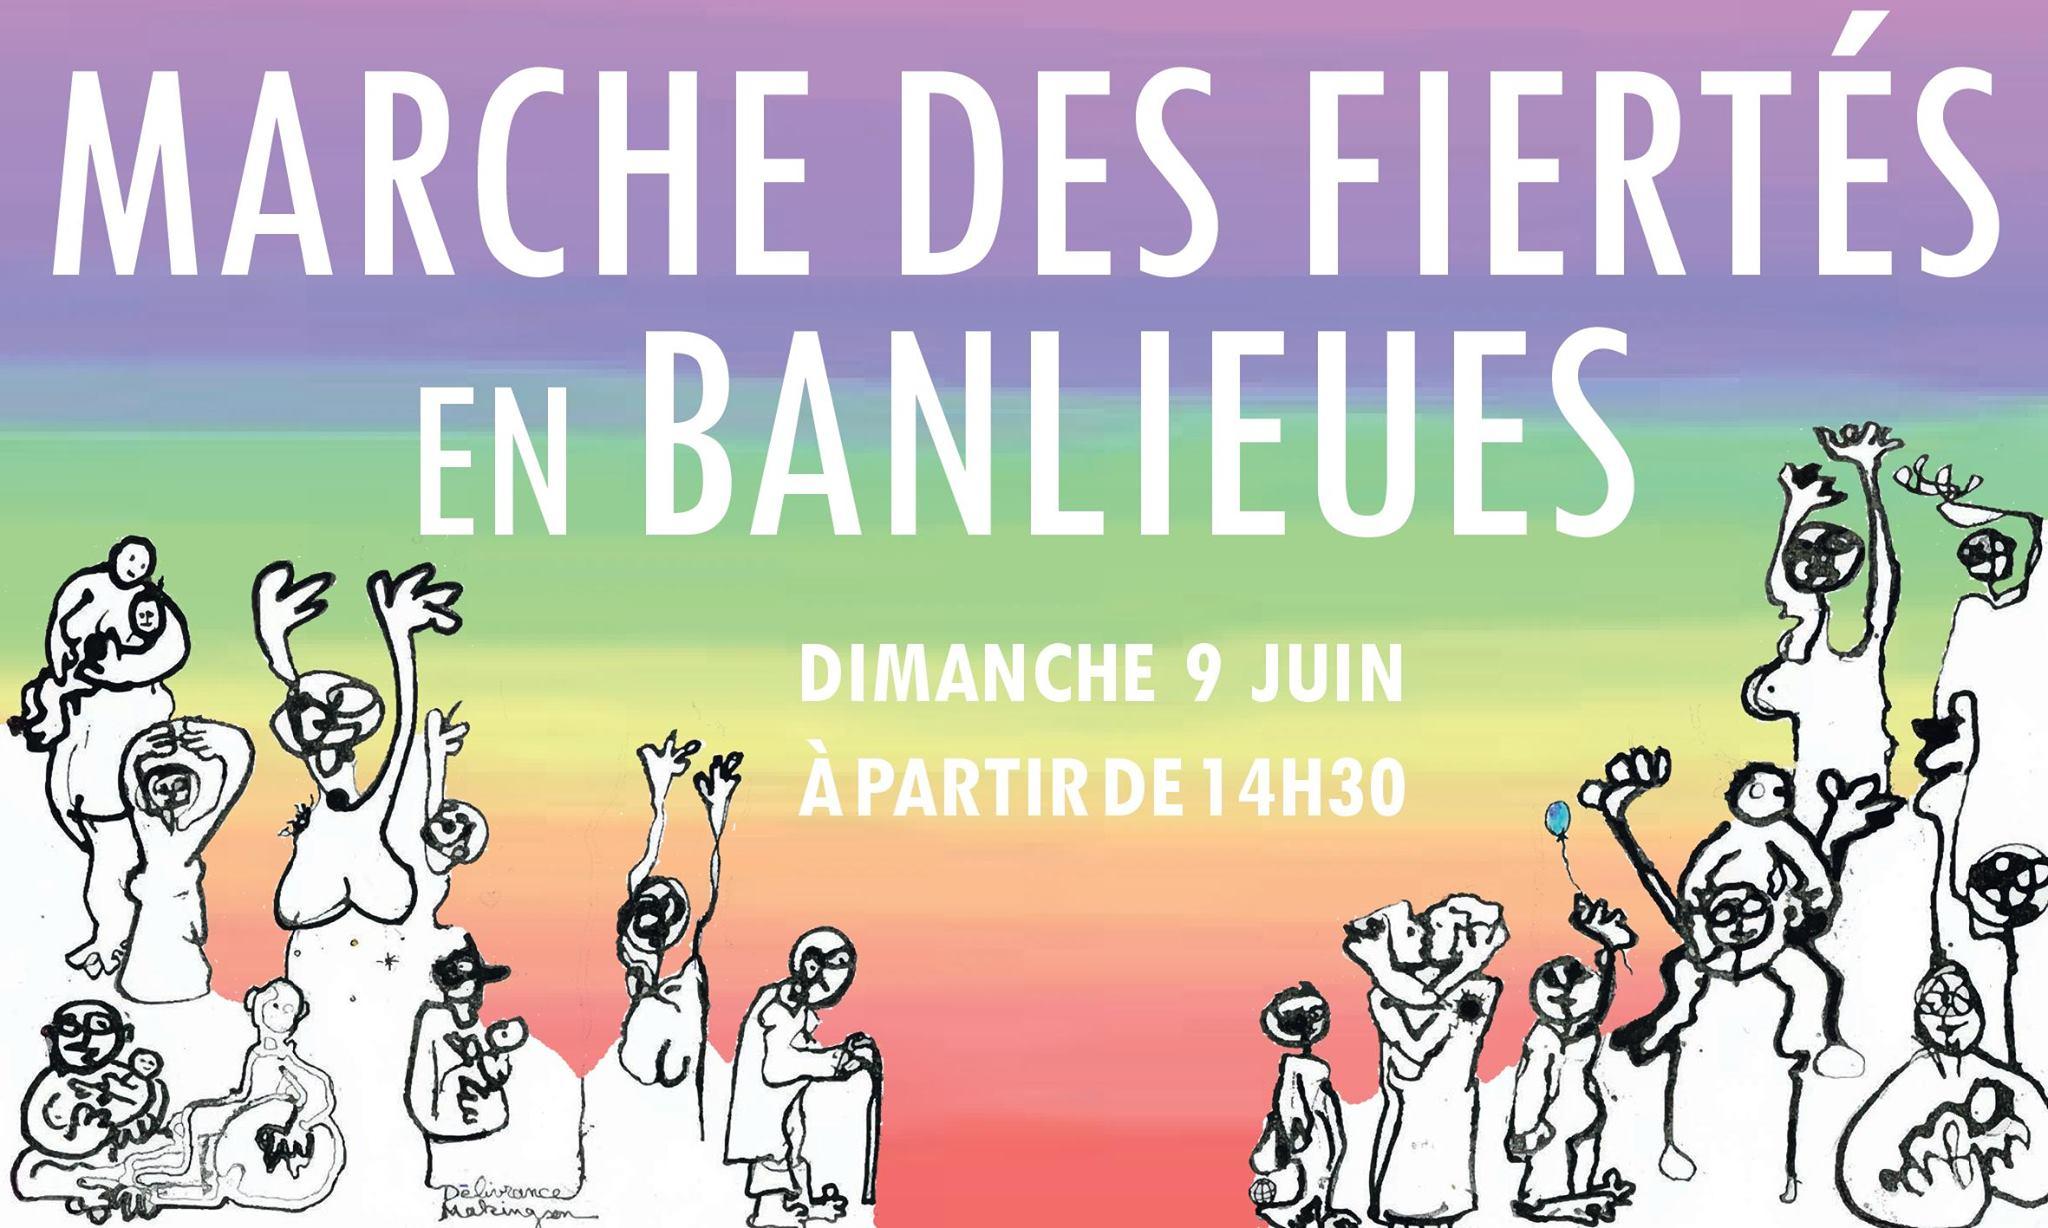 rencontre gay a bejaia à Saint Denis